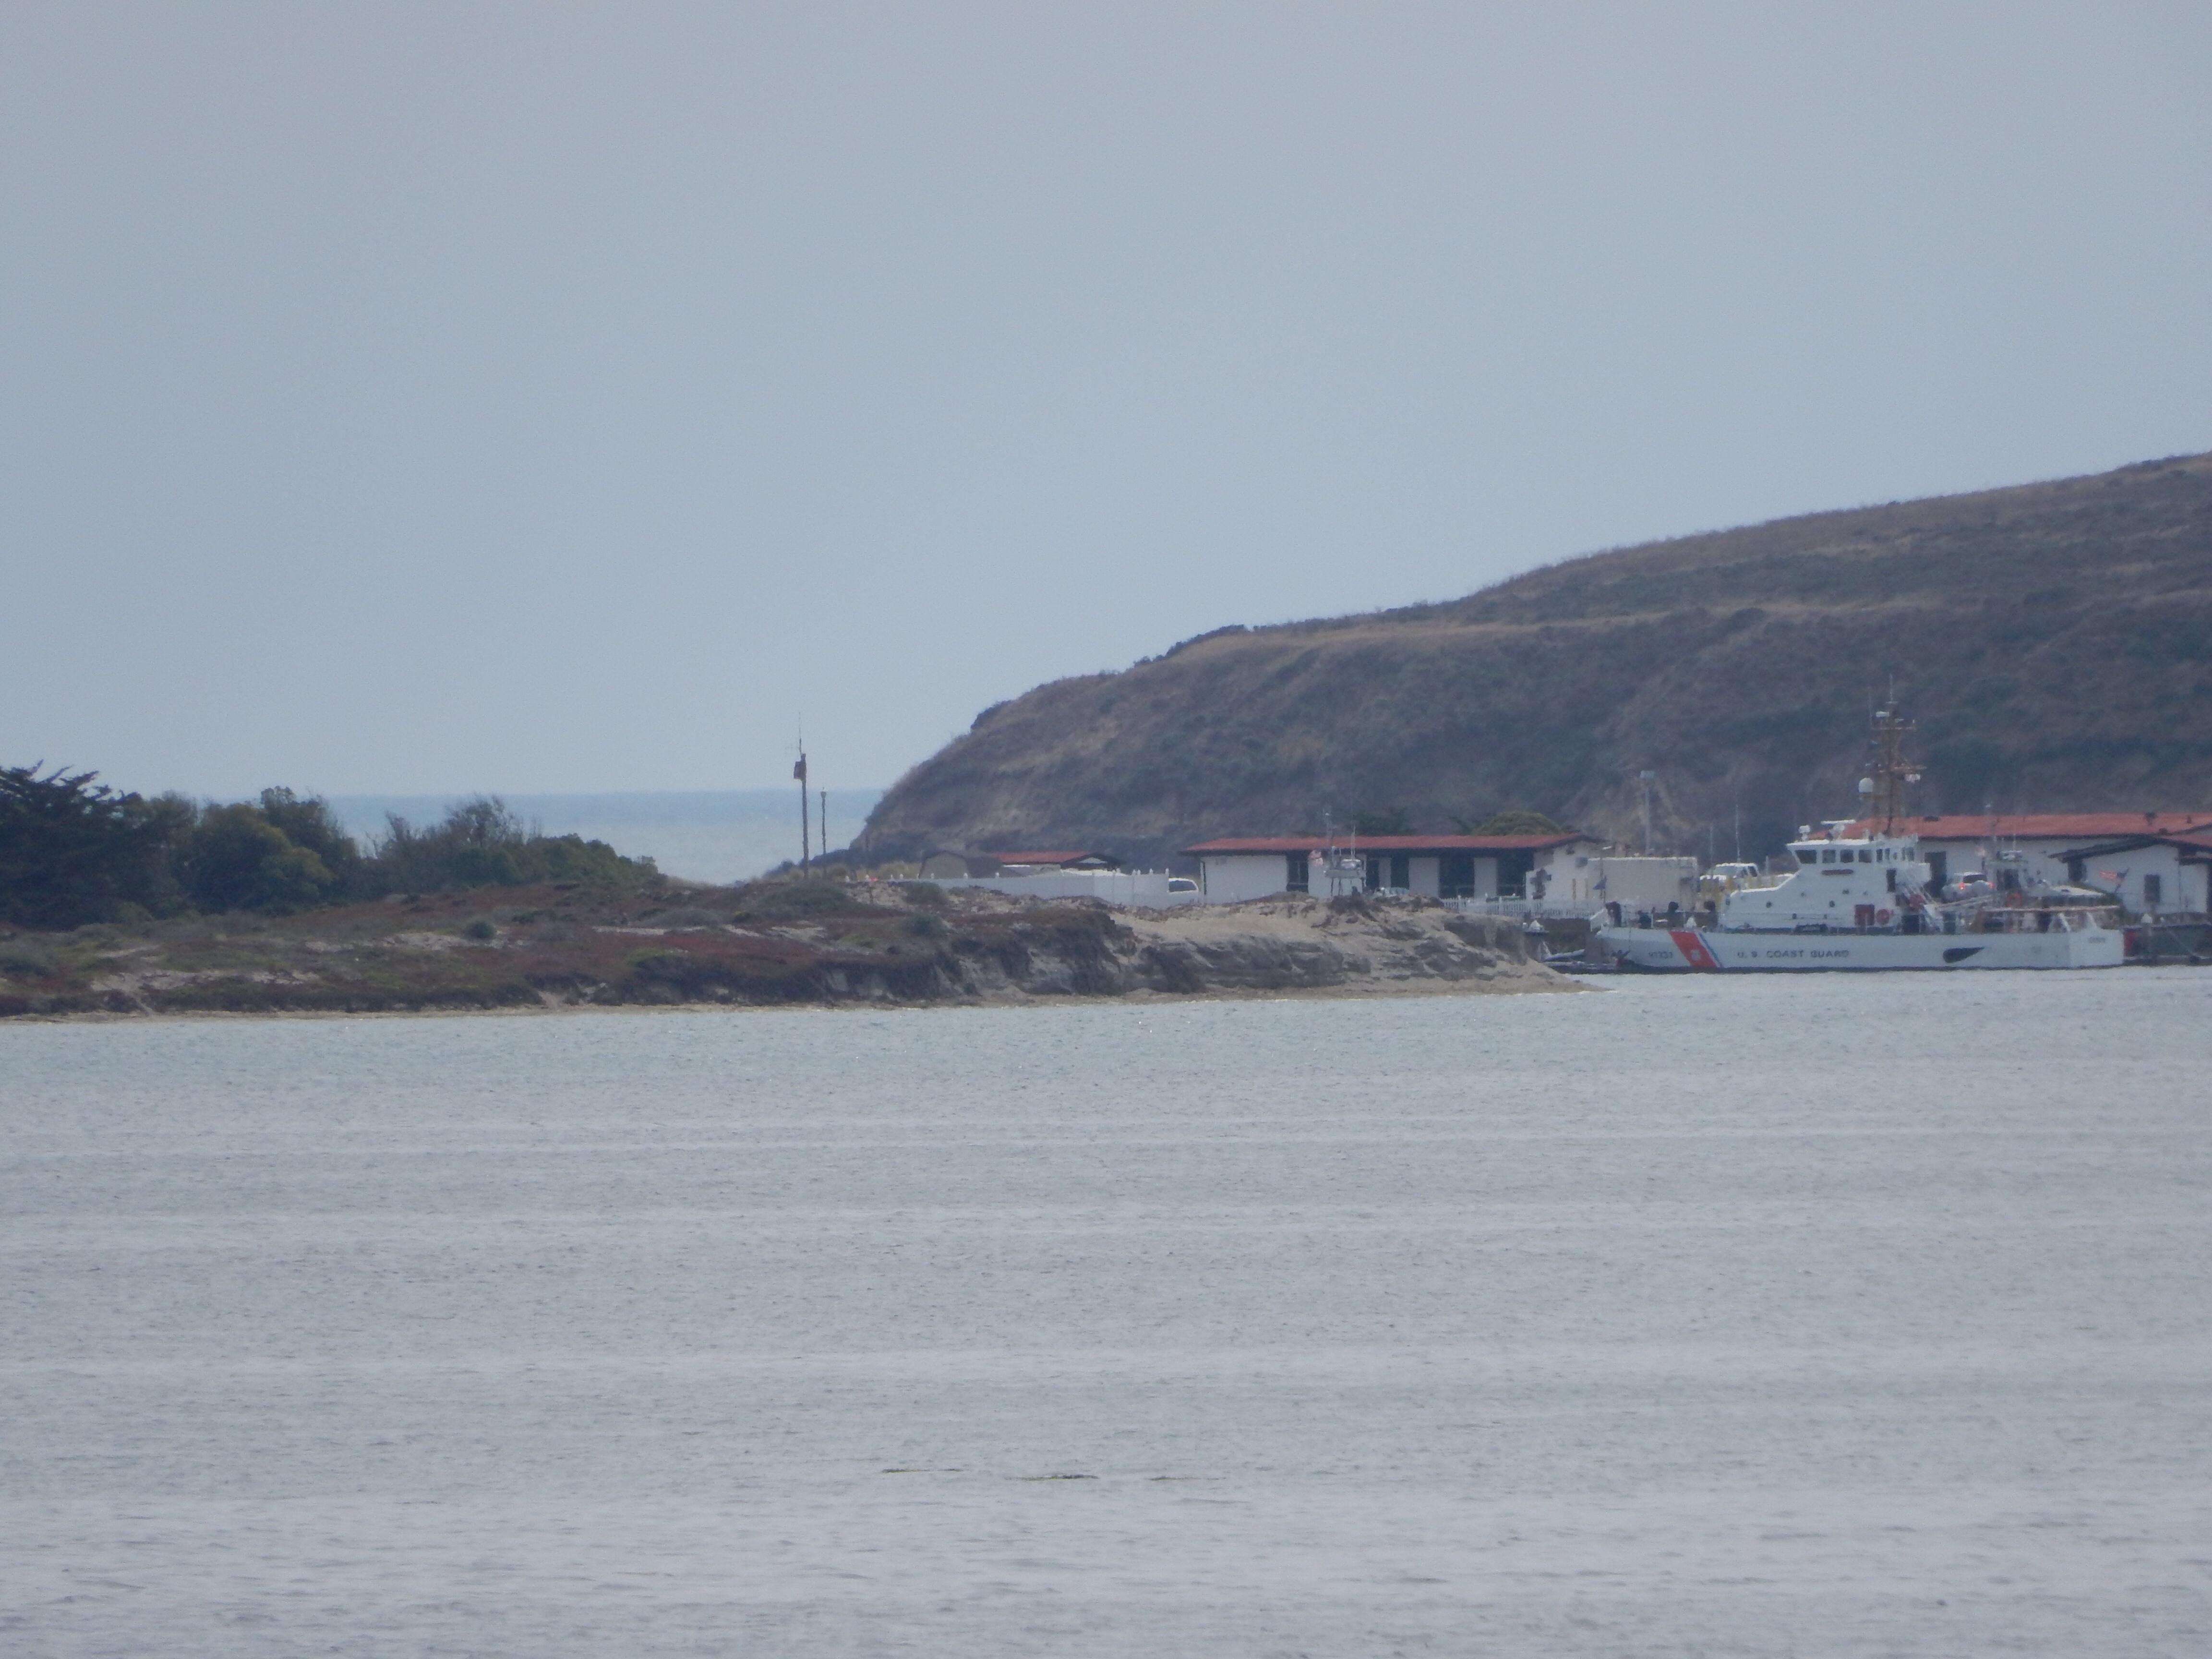 The Coast Guard station on Bodega Bay.